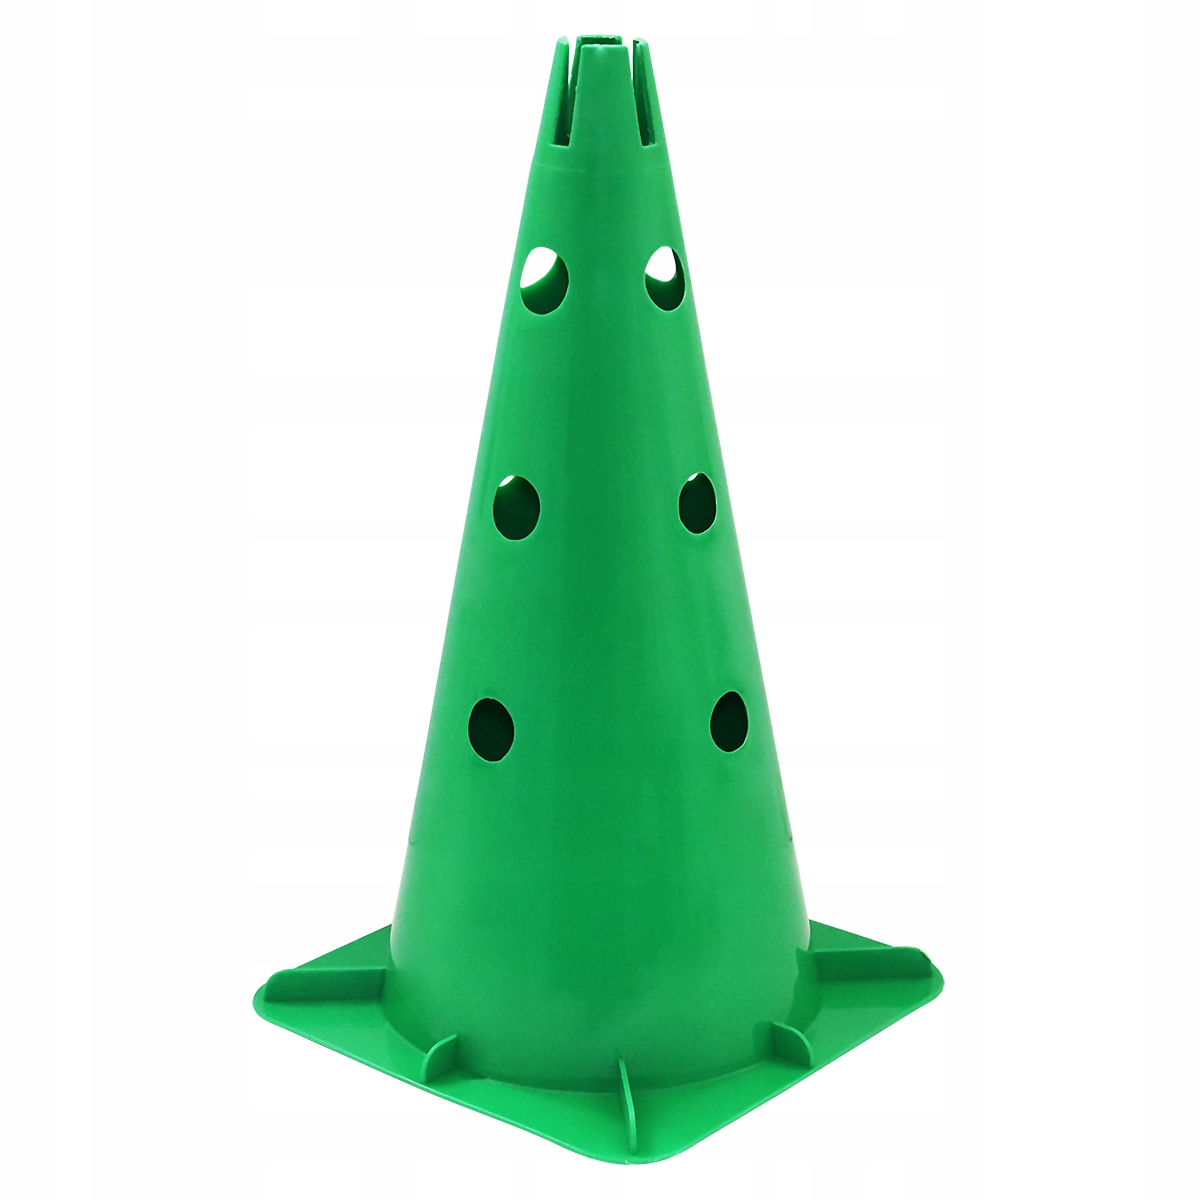 Pachołek 40 cm zielony